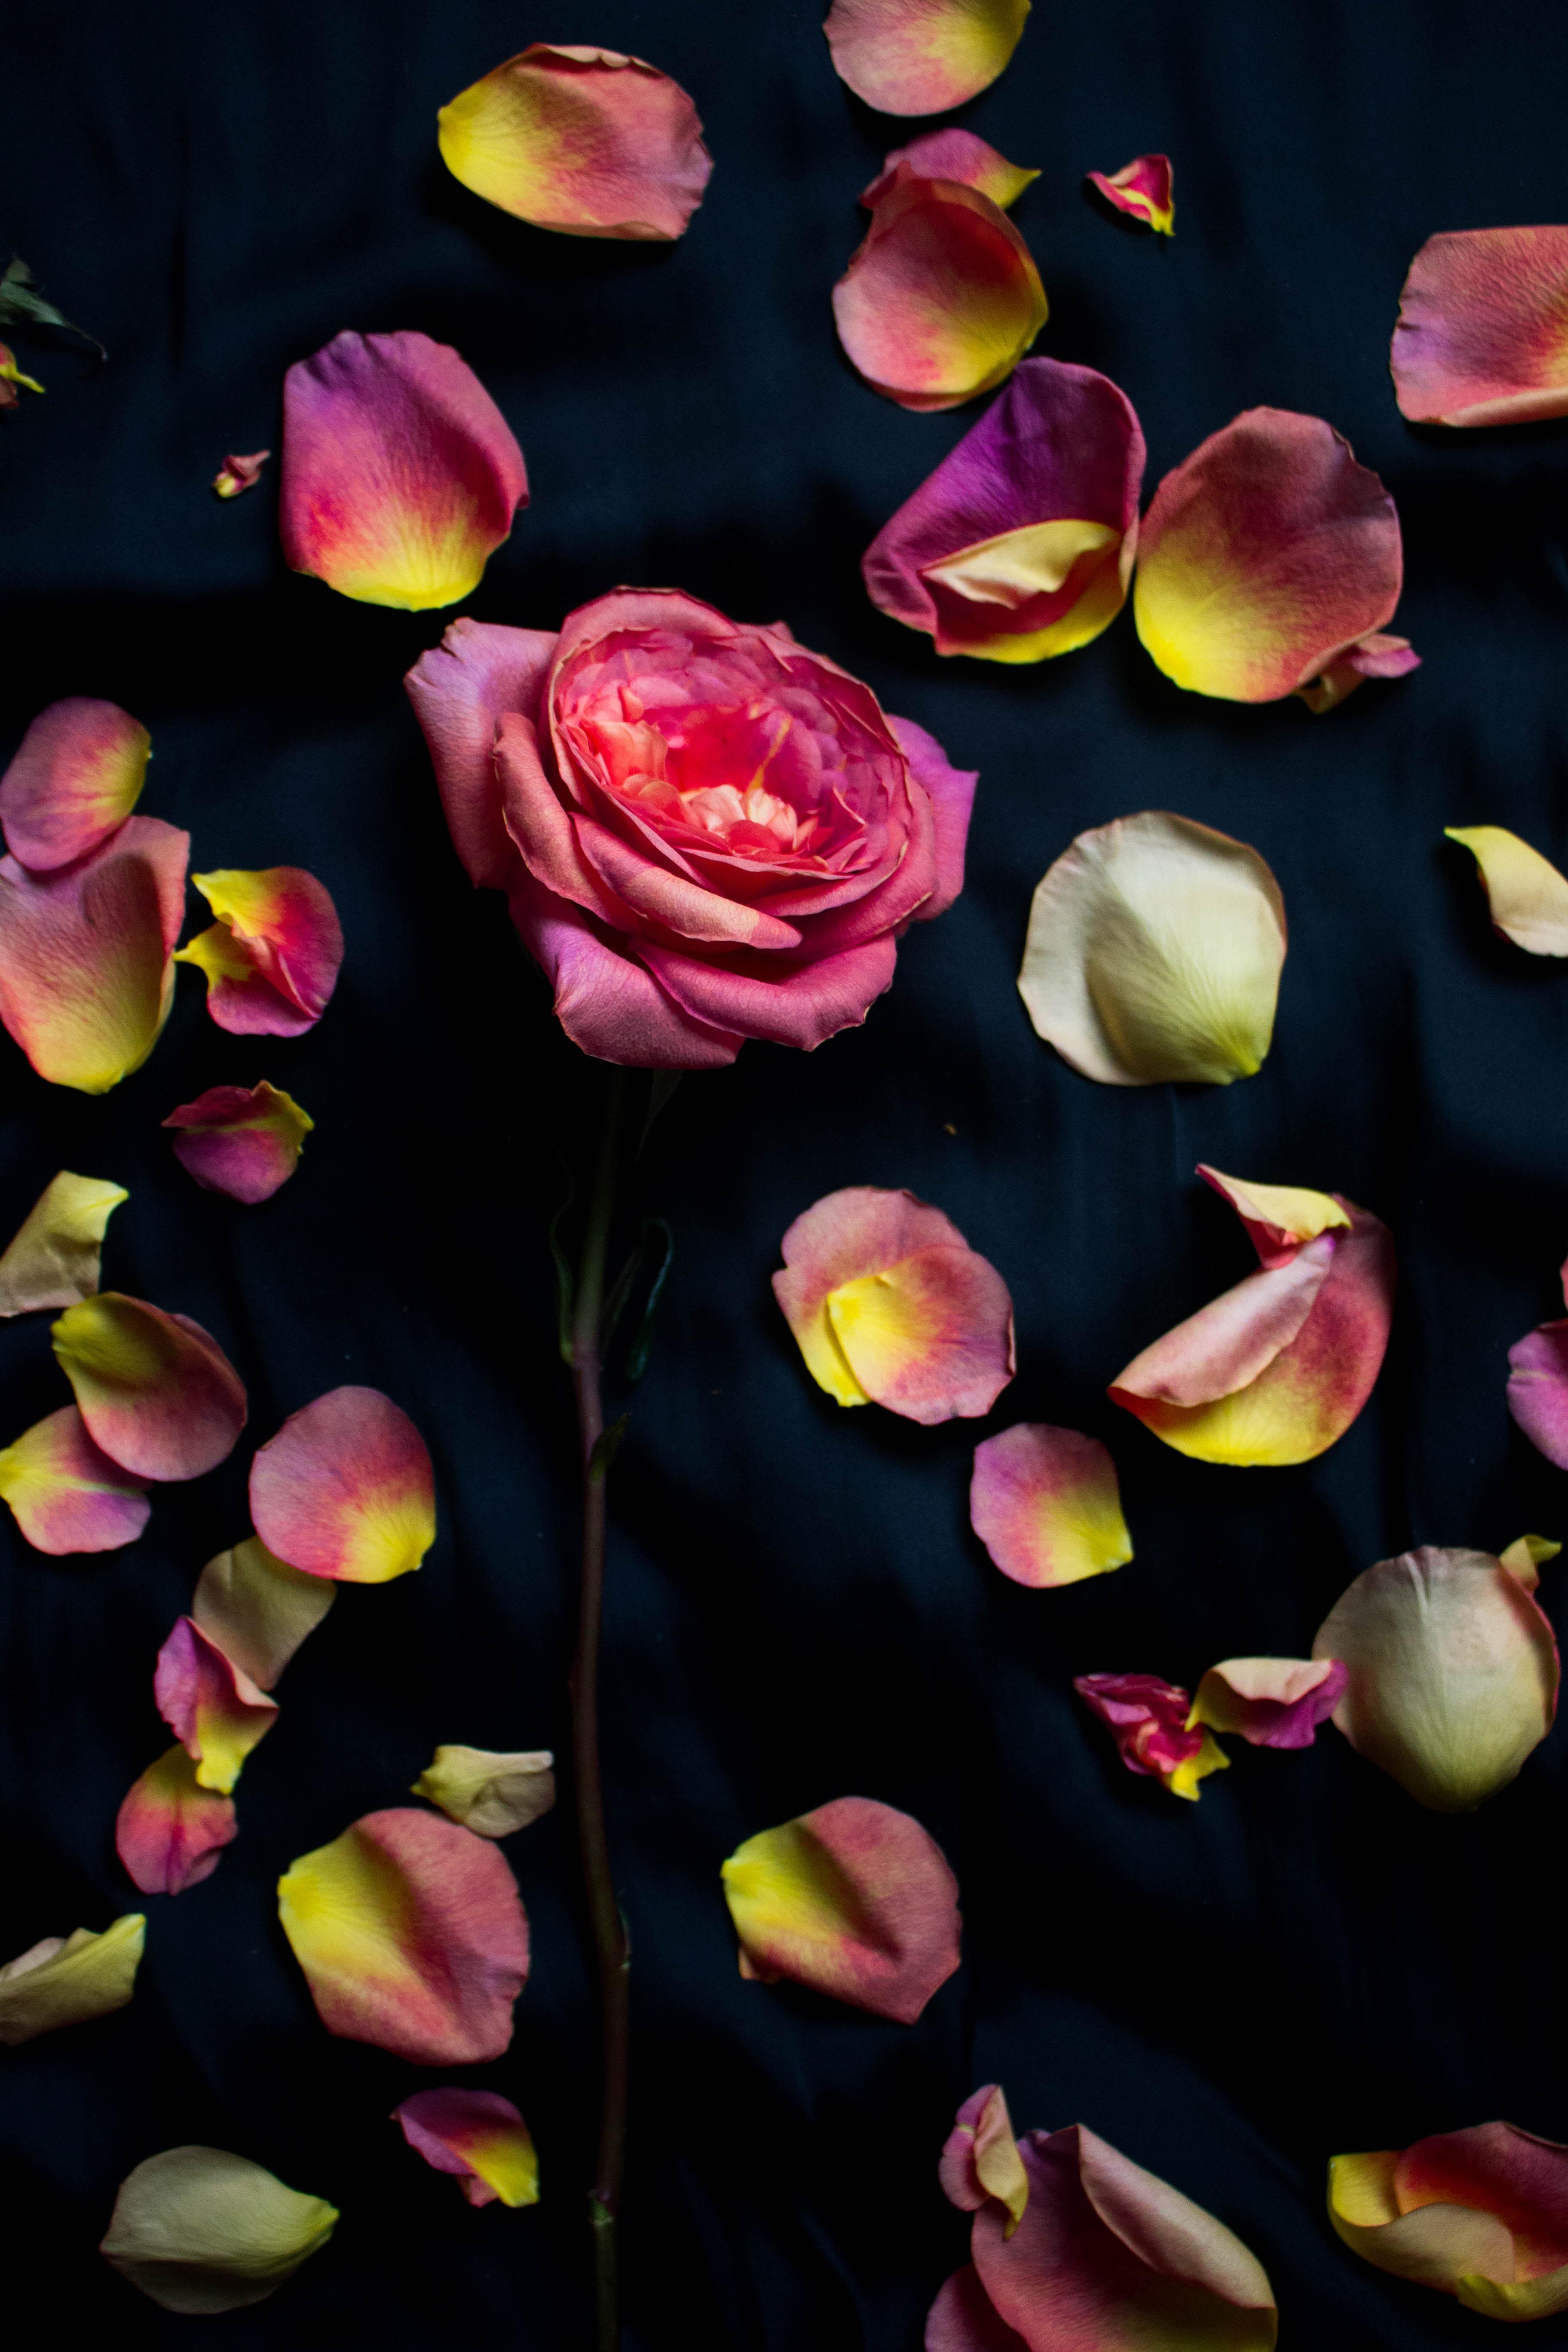 closeup photo of pink petals